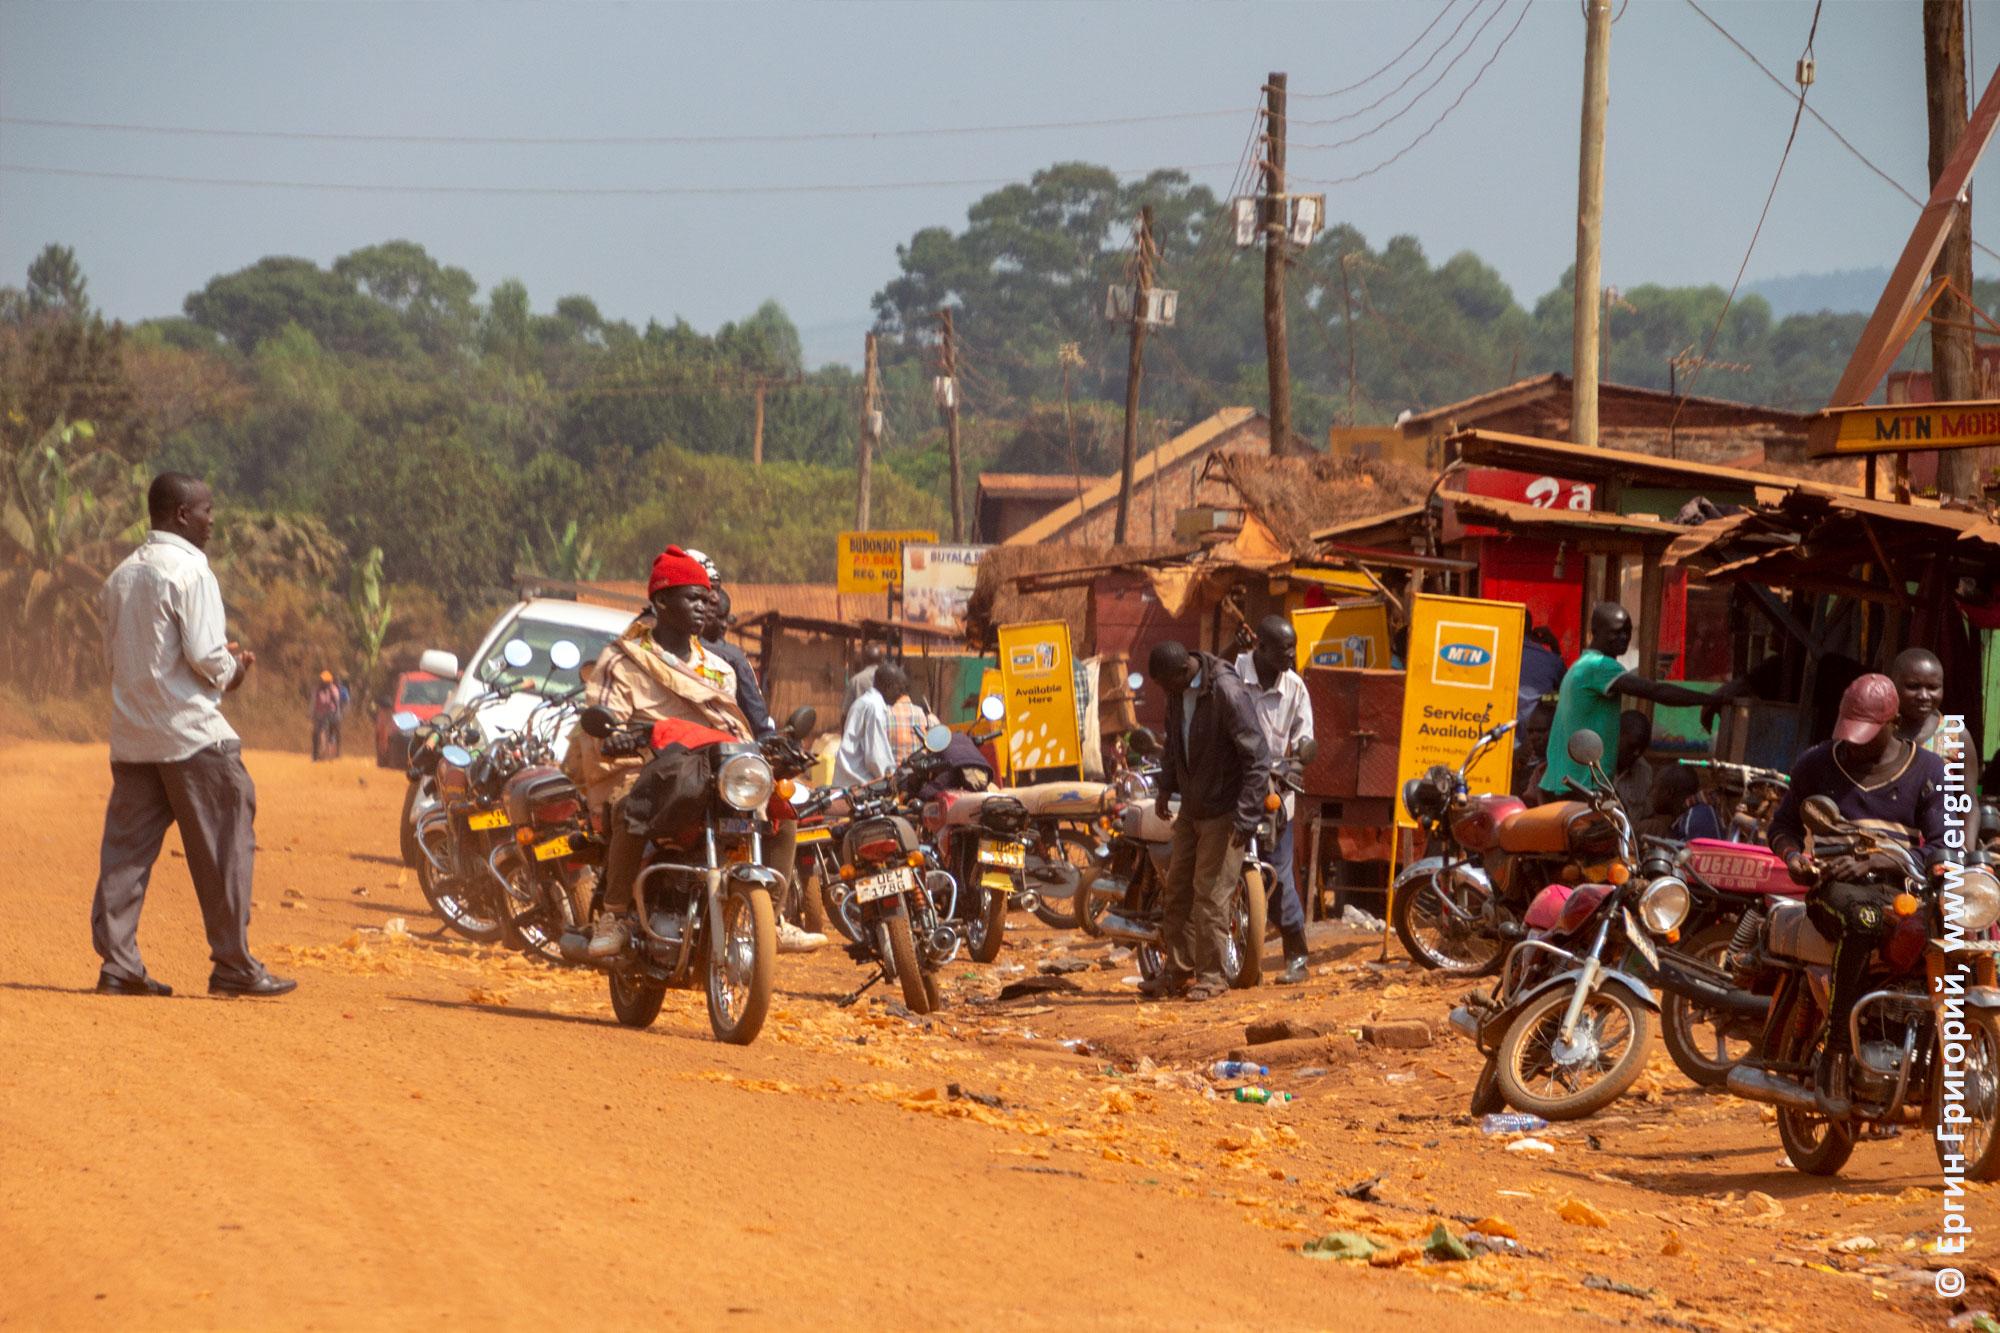 Деревня в Уганде